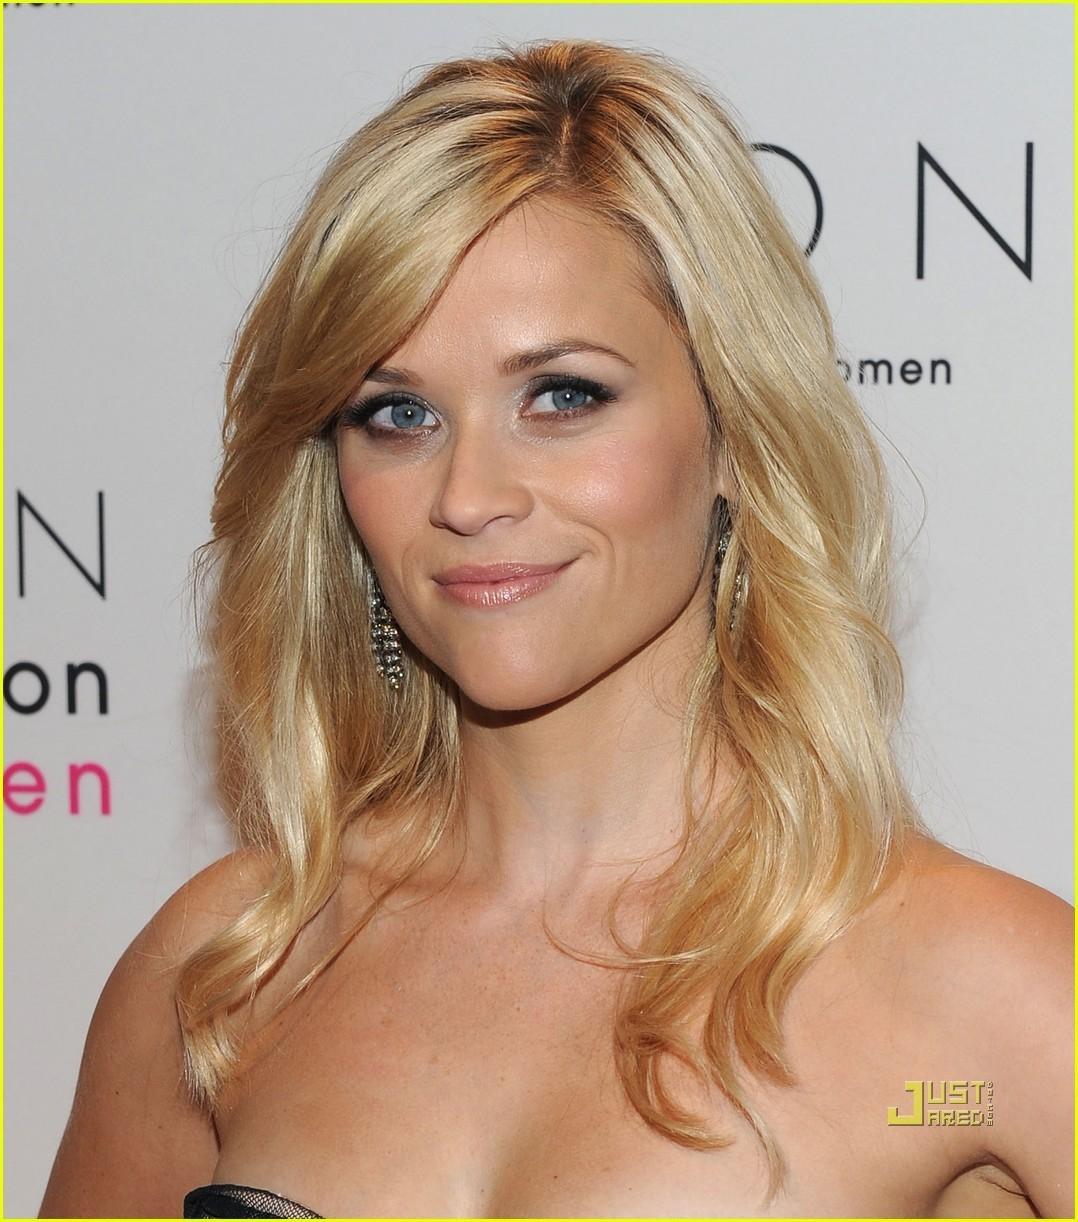 http://2.bp.blogspot.com/-0iW9z4r8oUU/T-bqQlKz0wI/AAAAAAAAAQM/cP47sbg-b4Q/s1600/Reese+Witherspoon.jpg